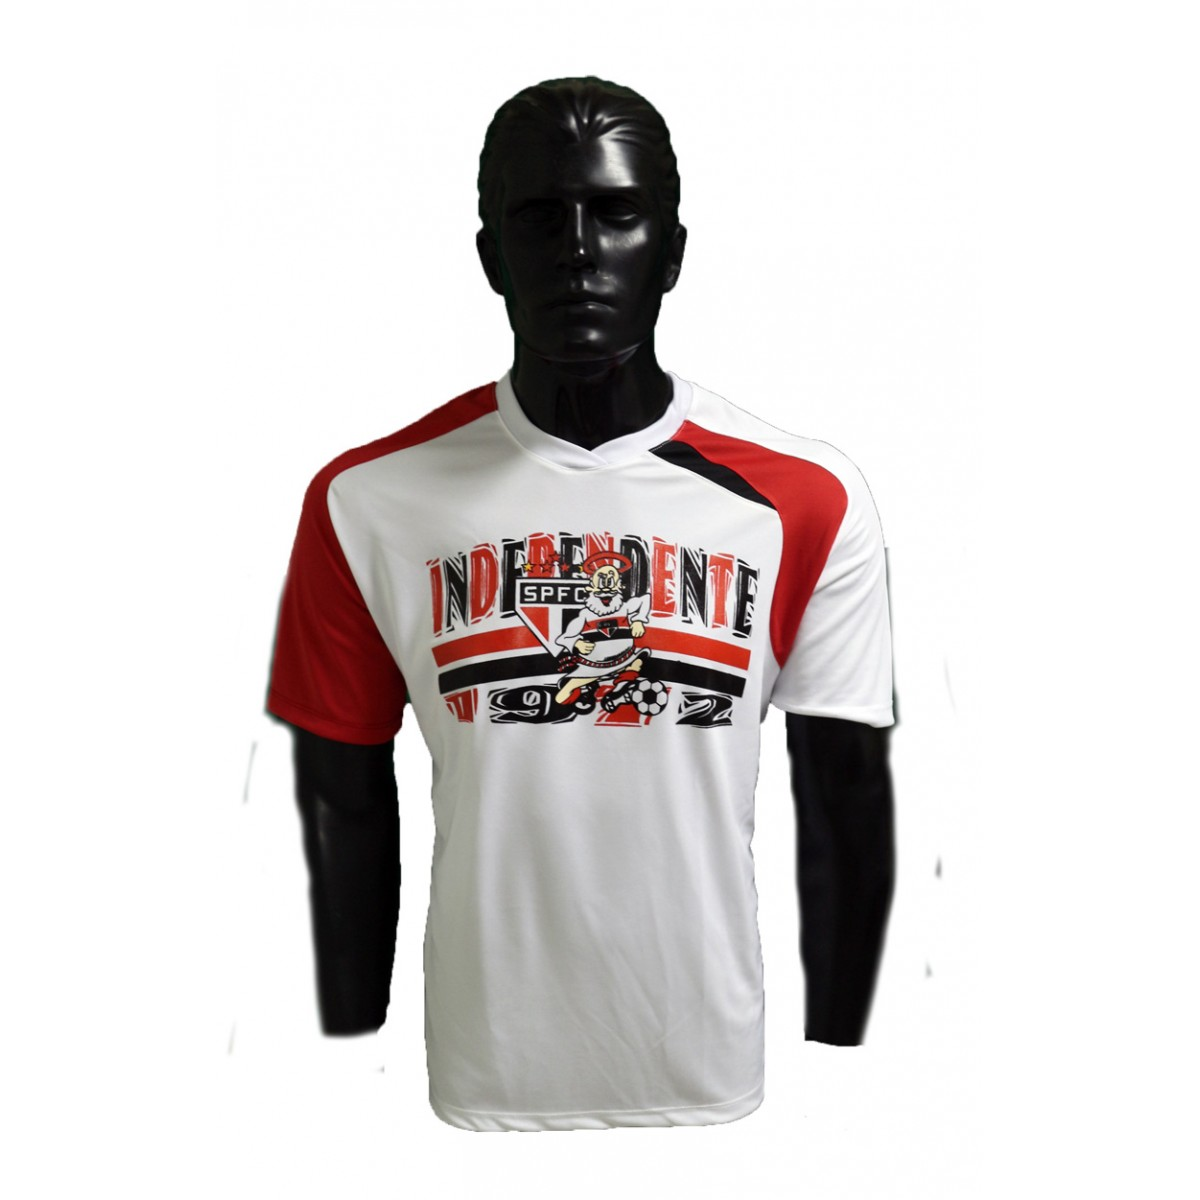 Camisa Torcida Independente Vovo Mascote